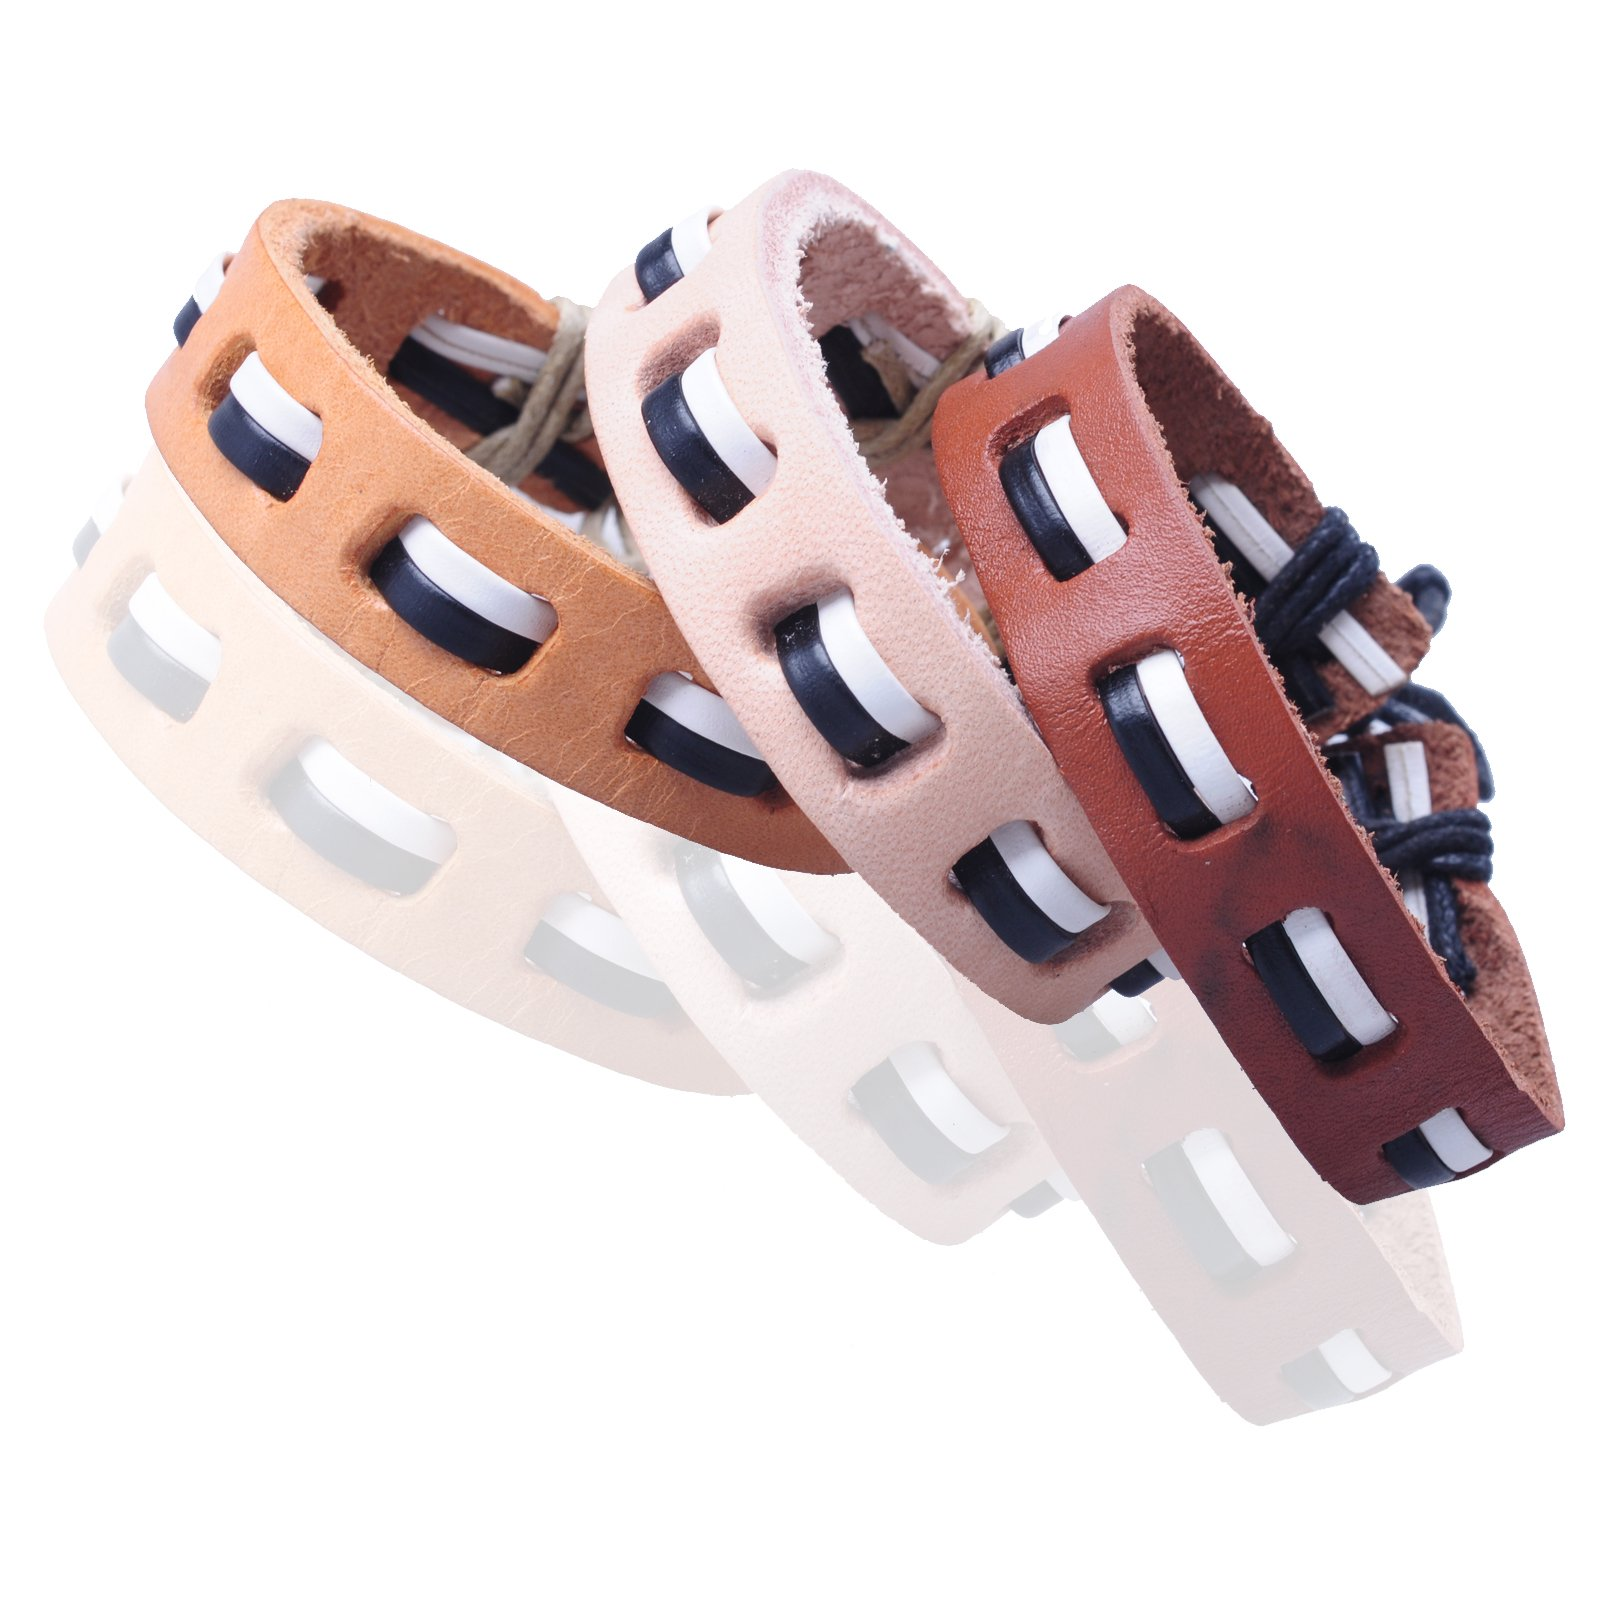 New-Fawn-Orange-Brown-Unisex-Genuine-Leather-Adjustable-Bracelets-Gift-086USANNA miniature 22